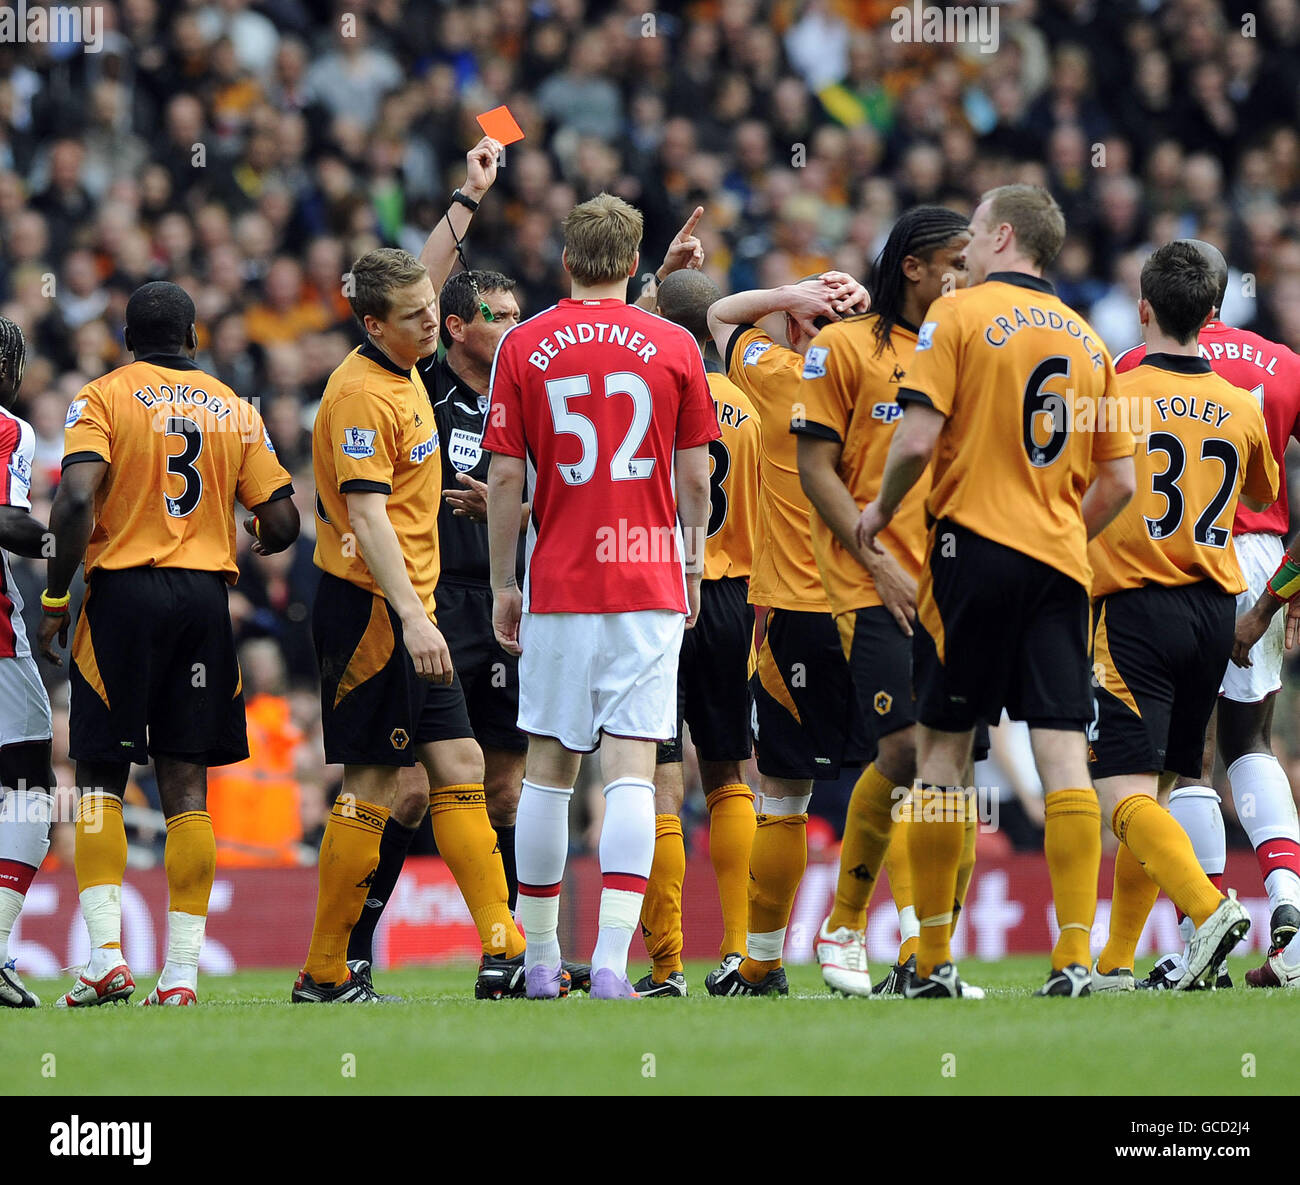 Soccer - Barclays Premier League - Arsenal v Wolverhampton Wanderers - Emirates Stadium - Stock Image